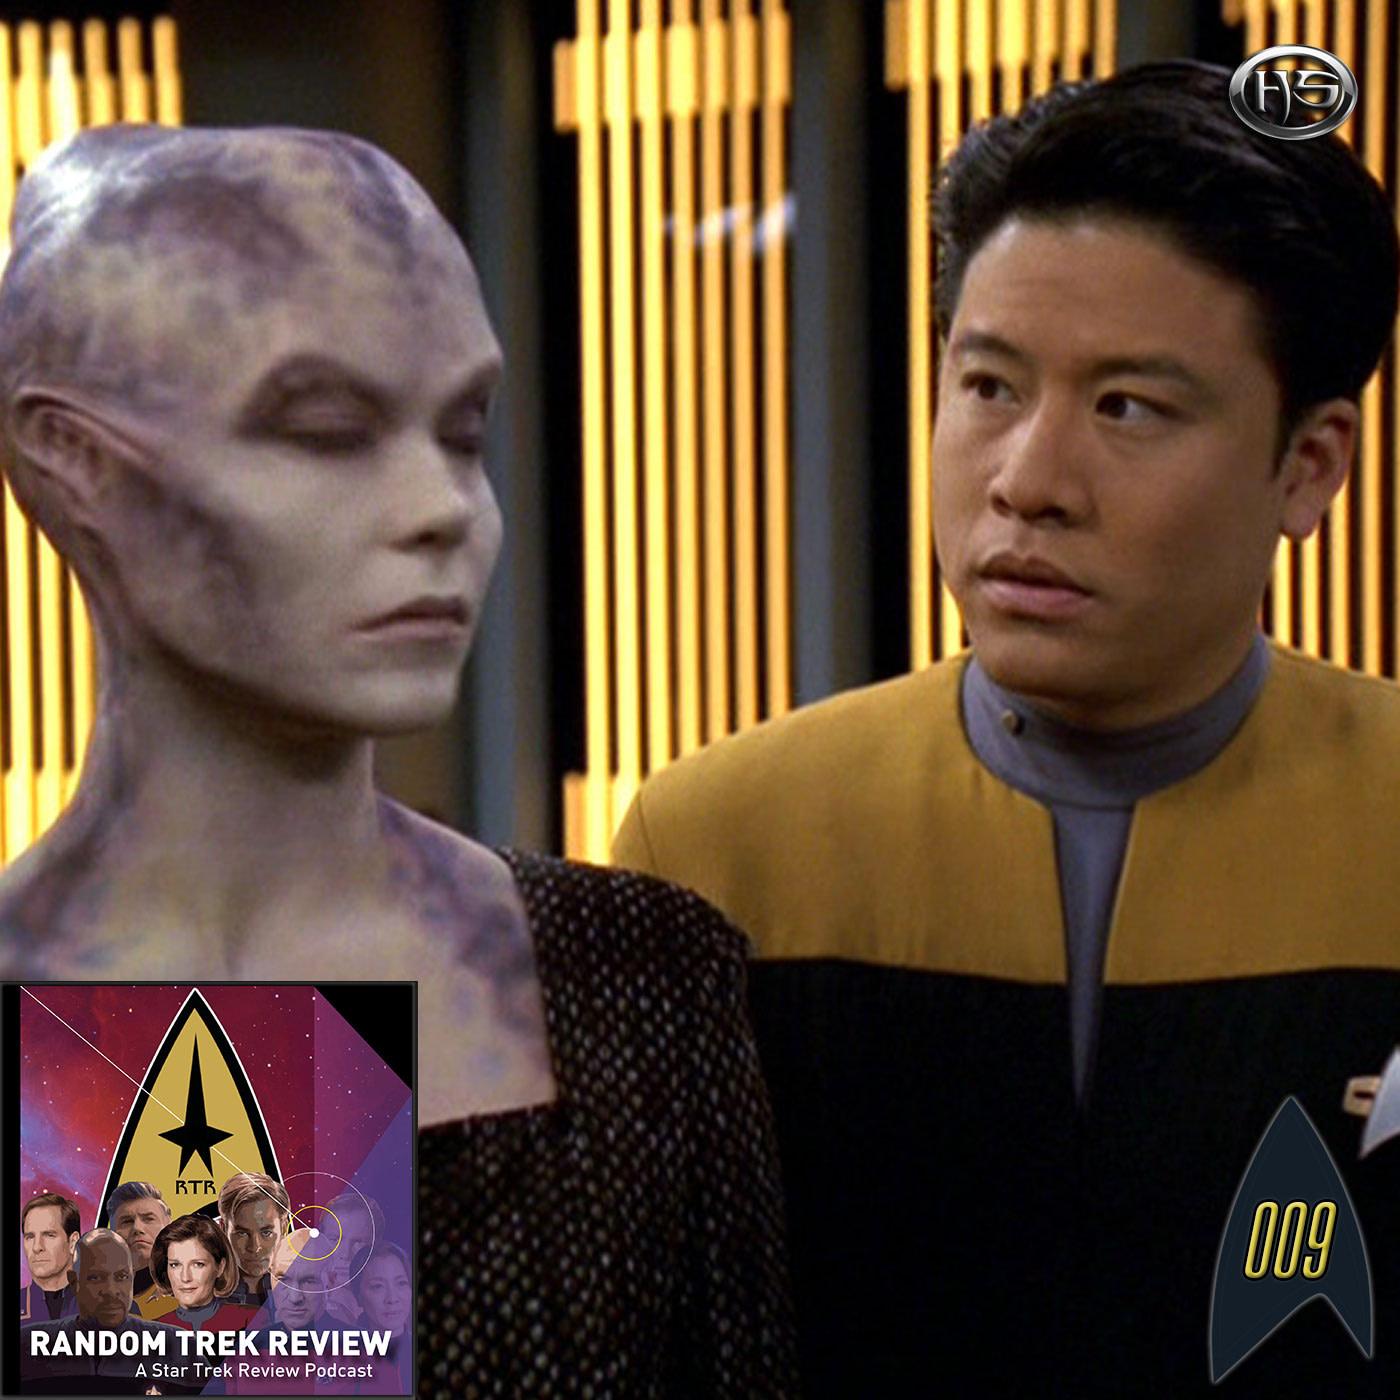 Random Trek Review Episode 9